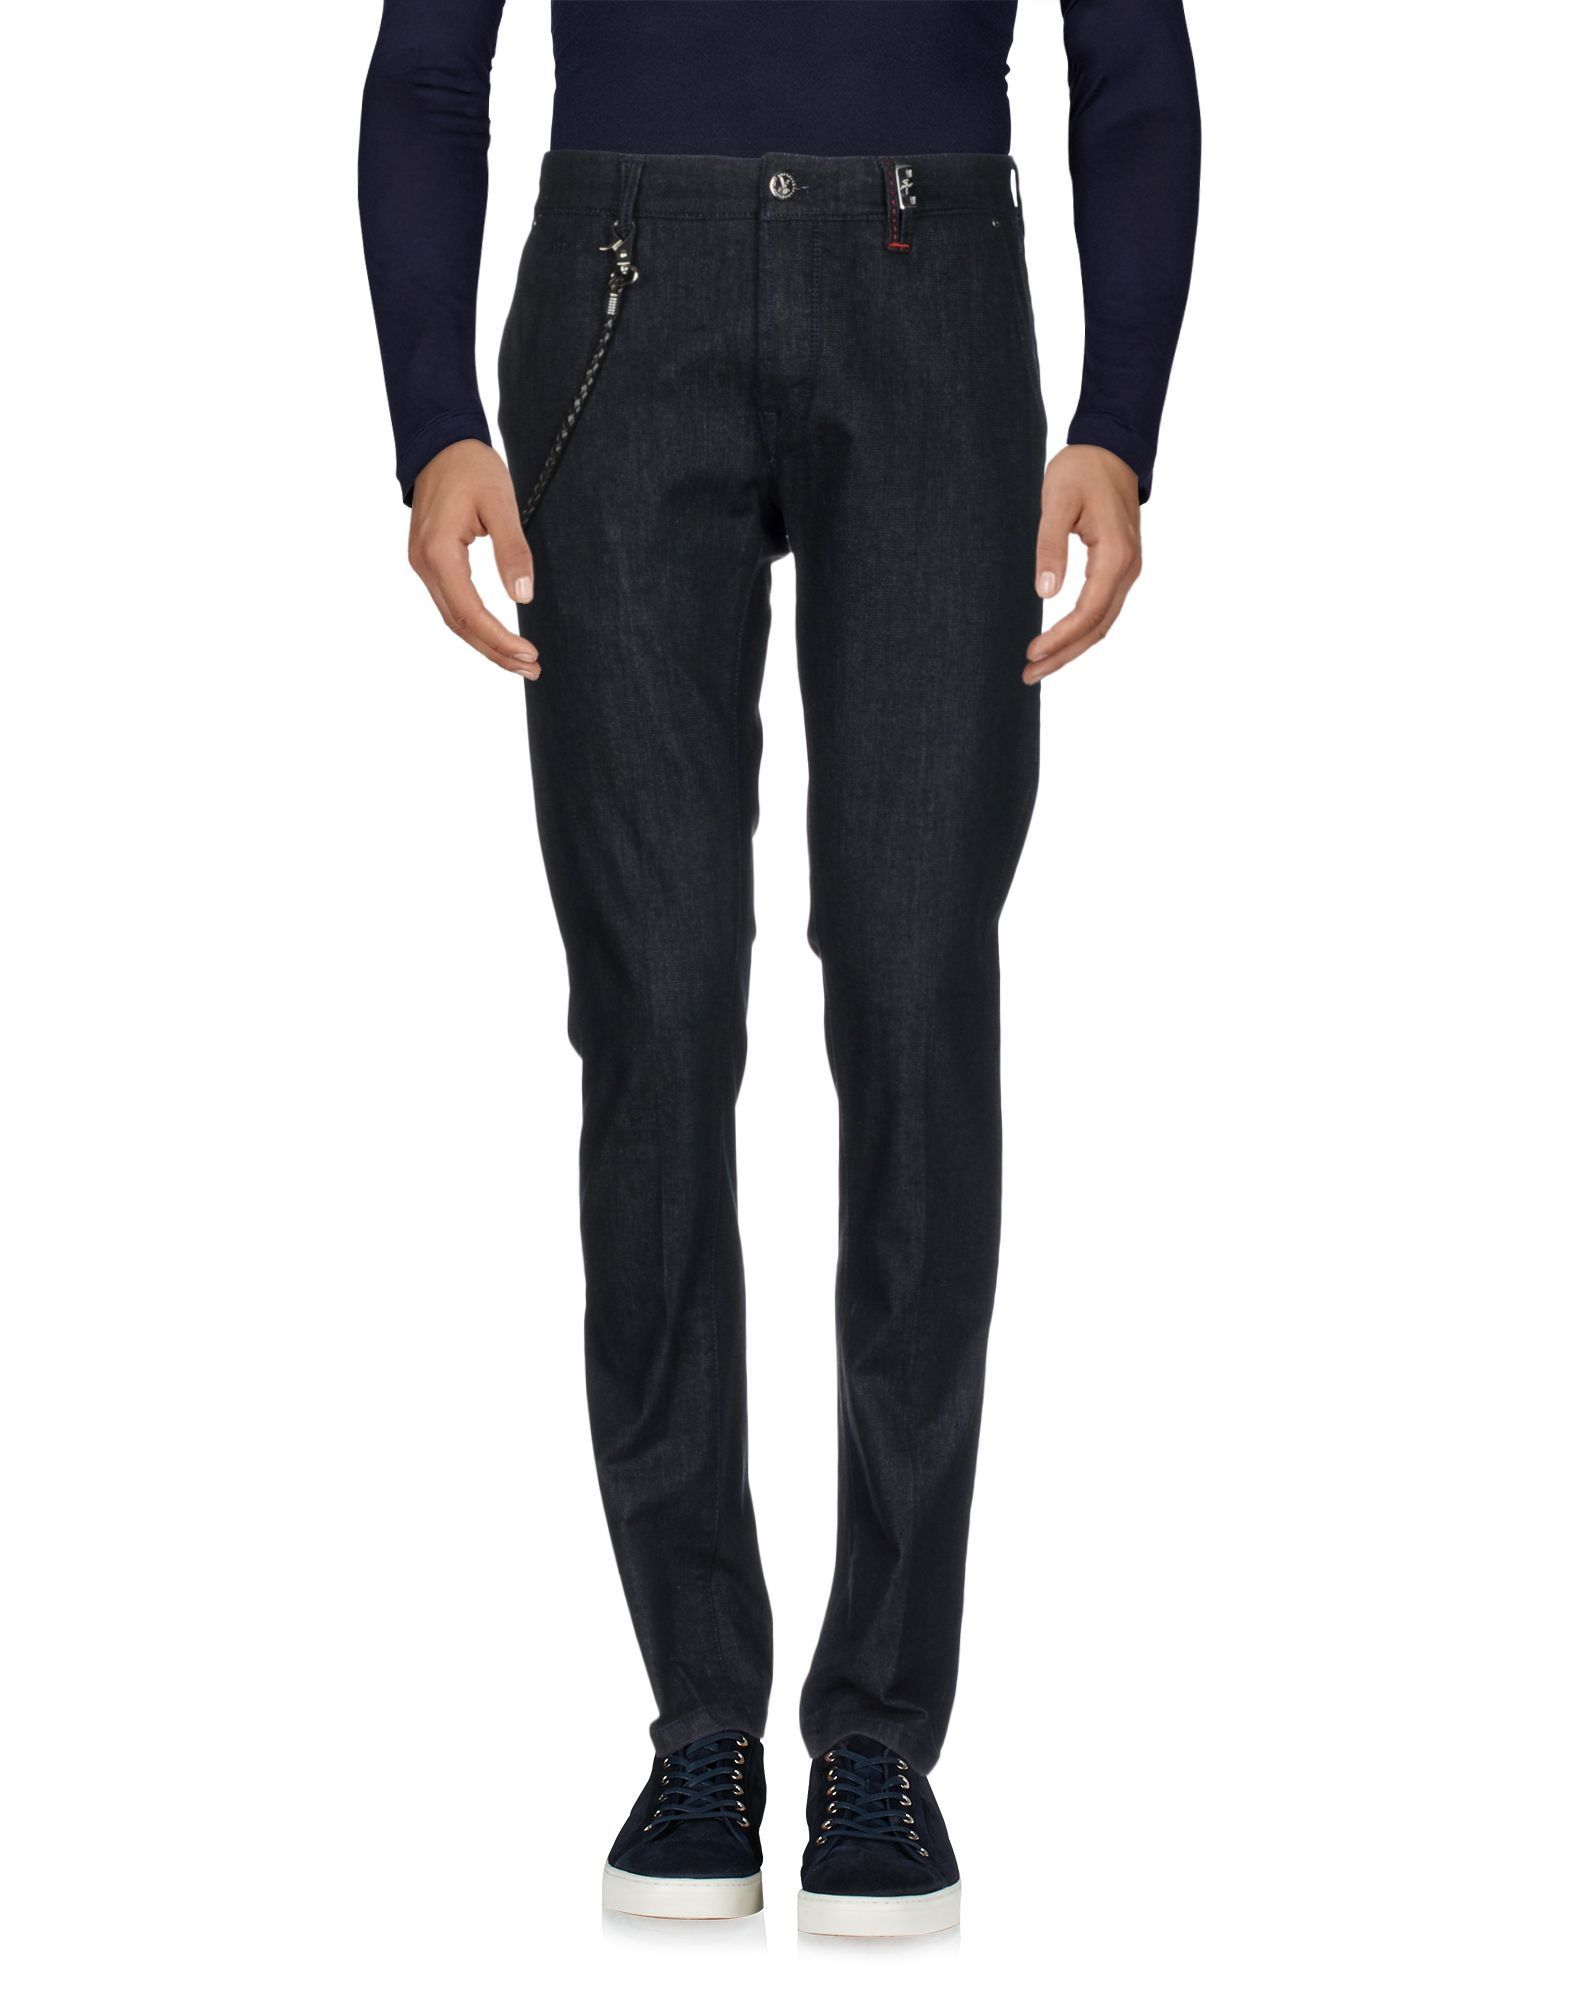 Pantaloni Jeans Tramarossa Donna - Acquista online su